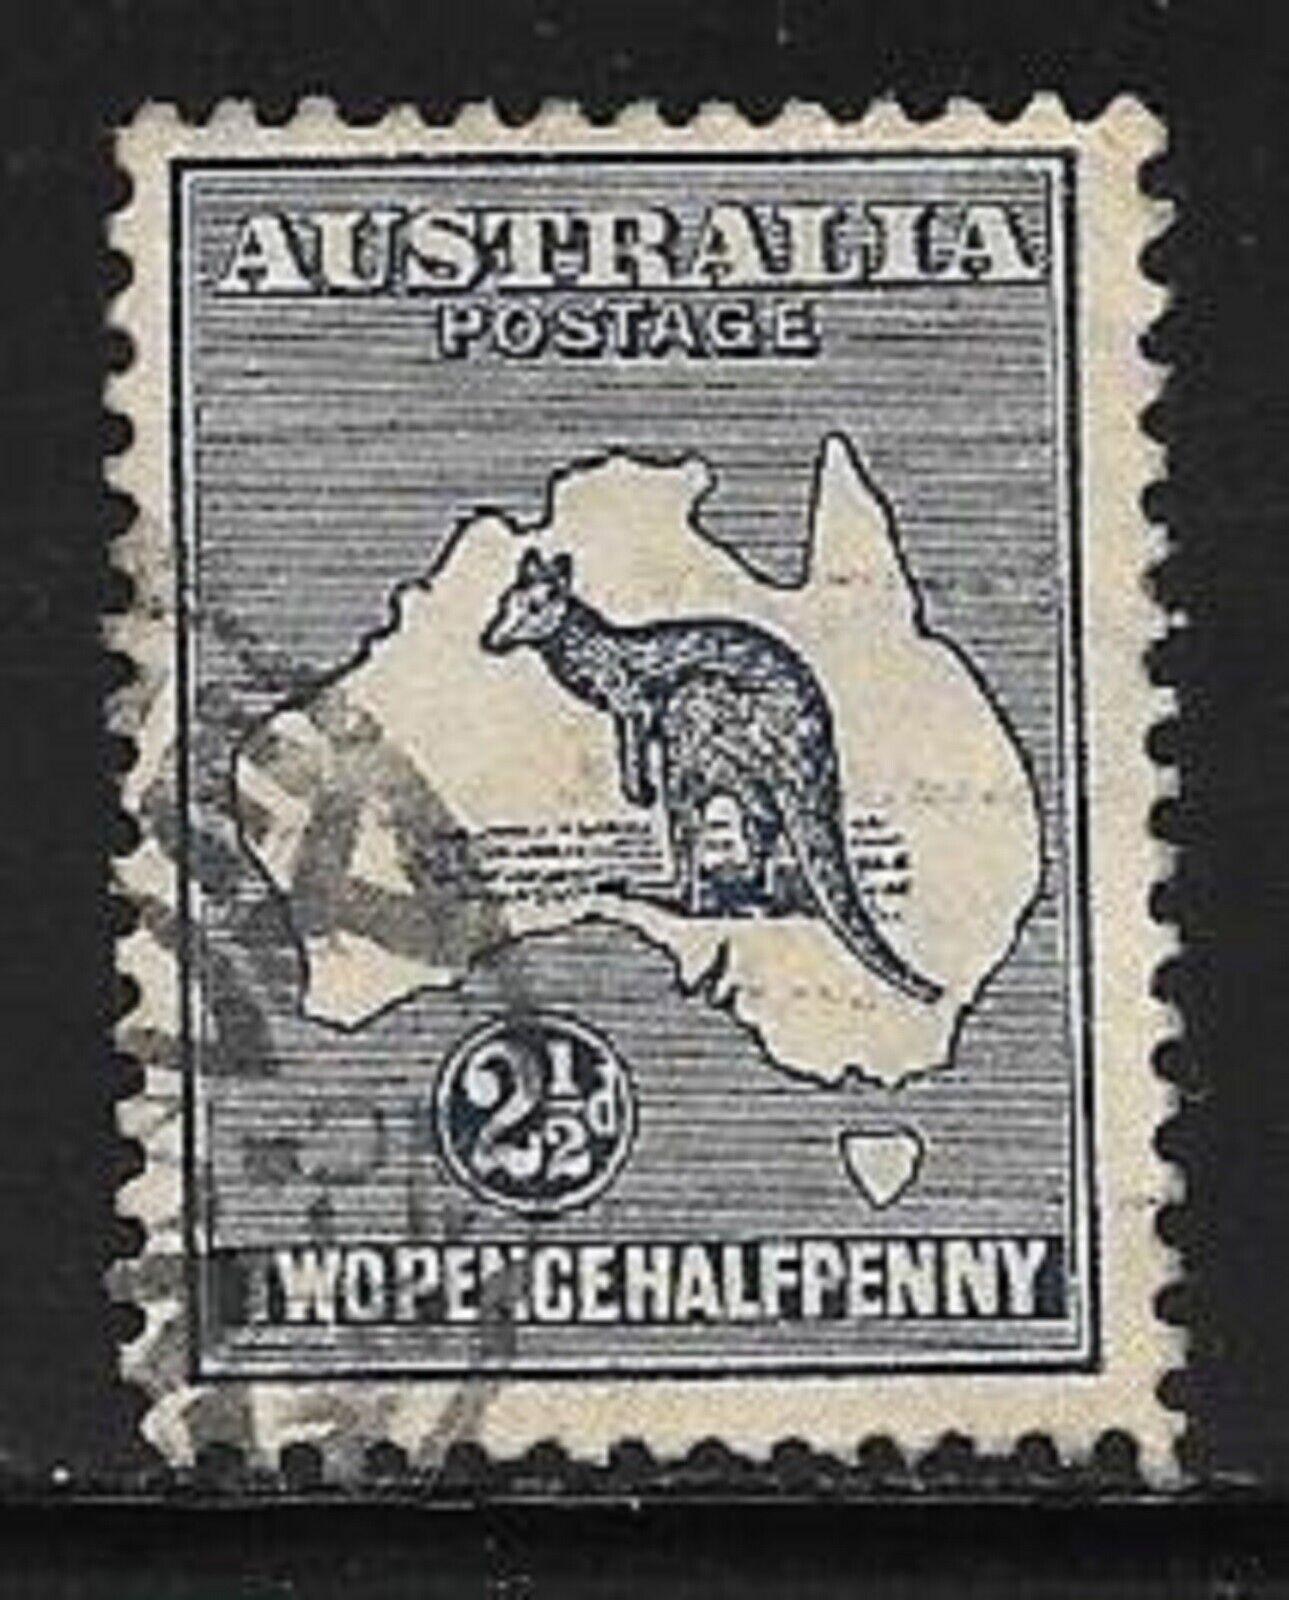 CC AUSTRALIA USED 39 CV 37.50 - $5.50